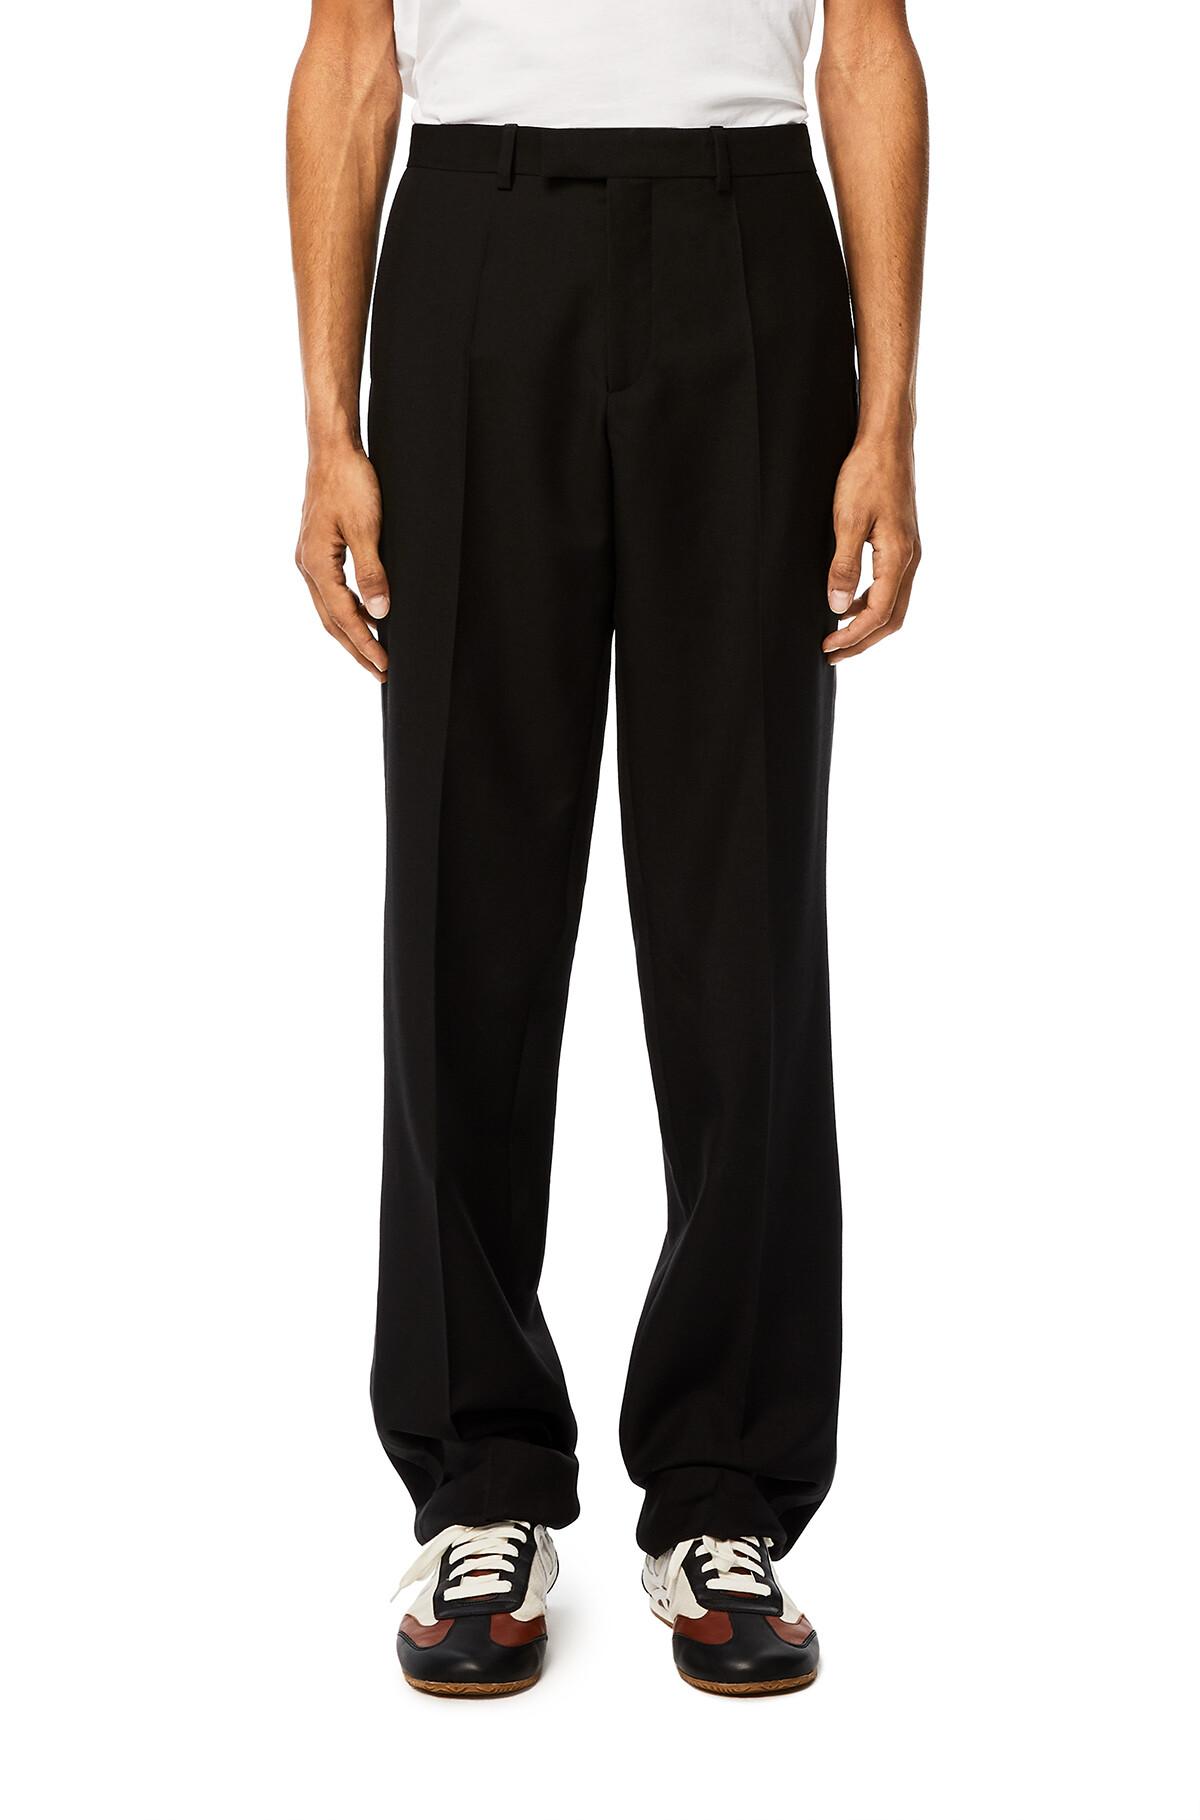 LOEWE Trousers Black front